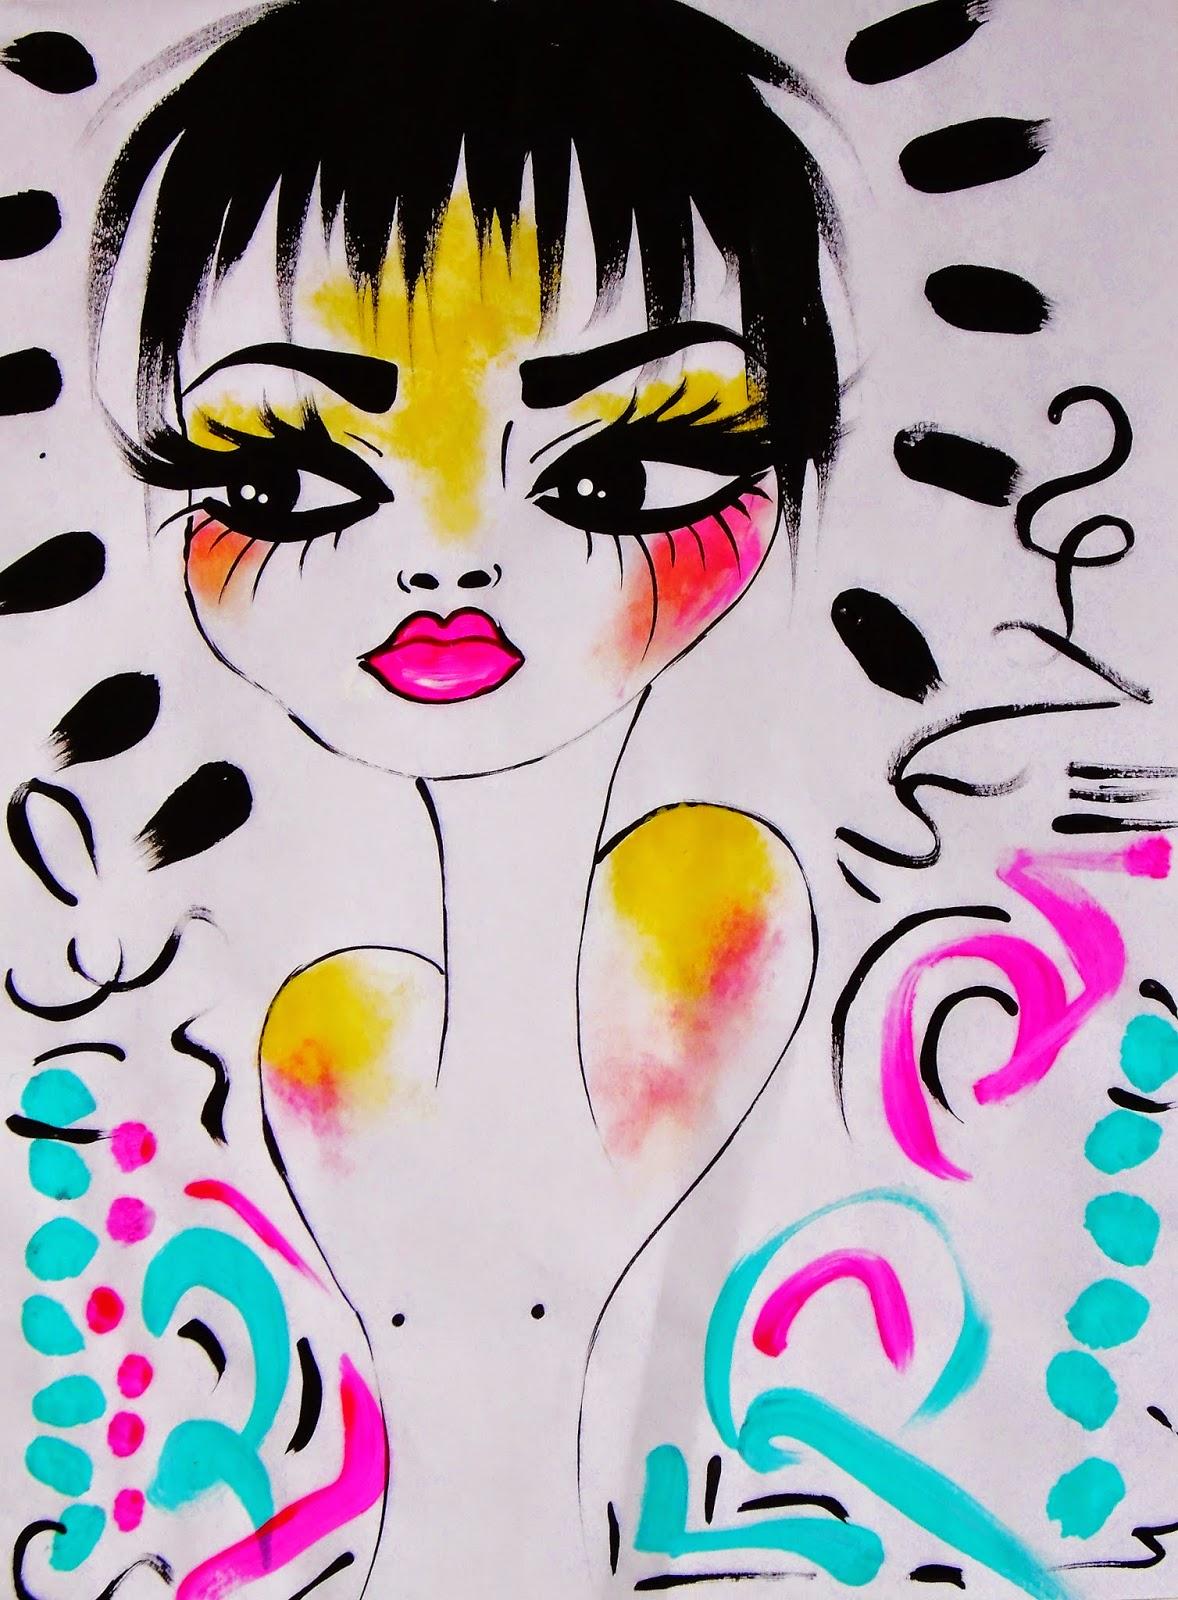 Art by Bebee Pino - Drawing/Painting by Bebee Pino